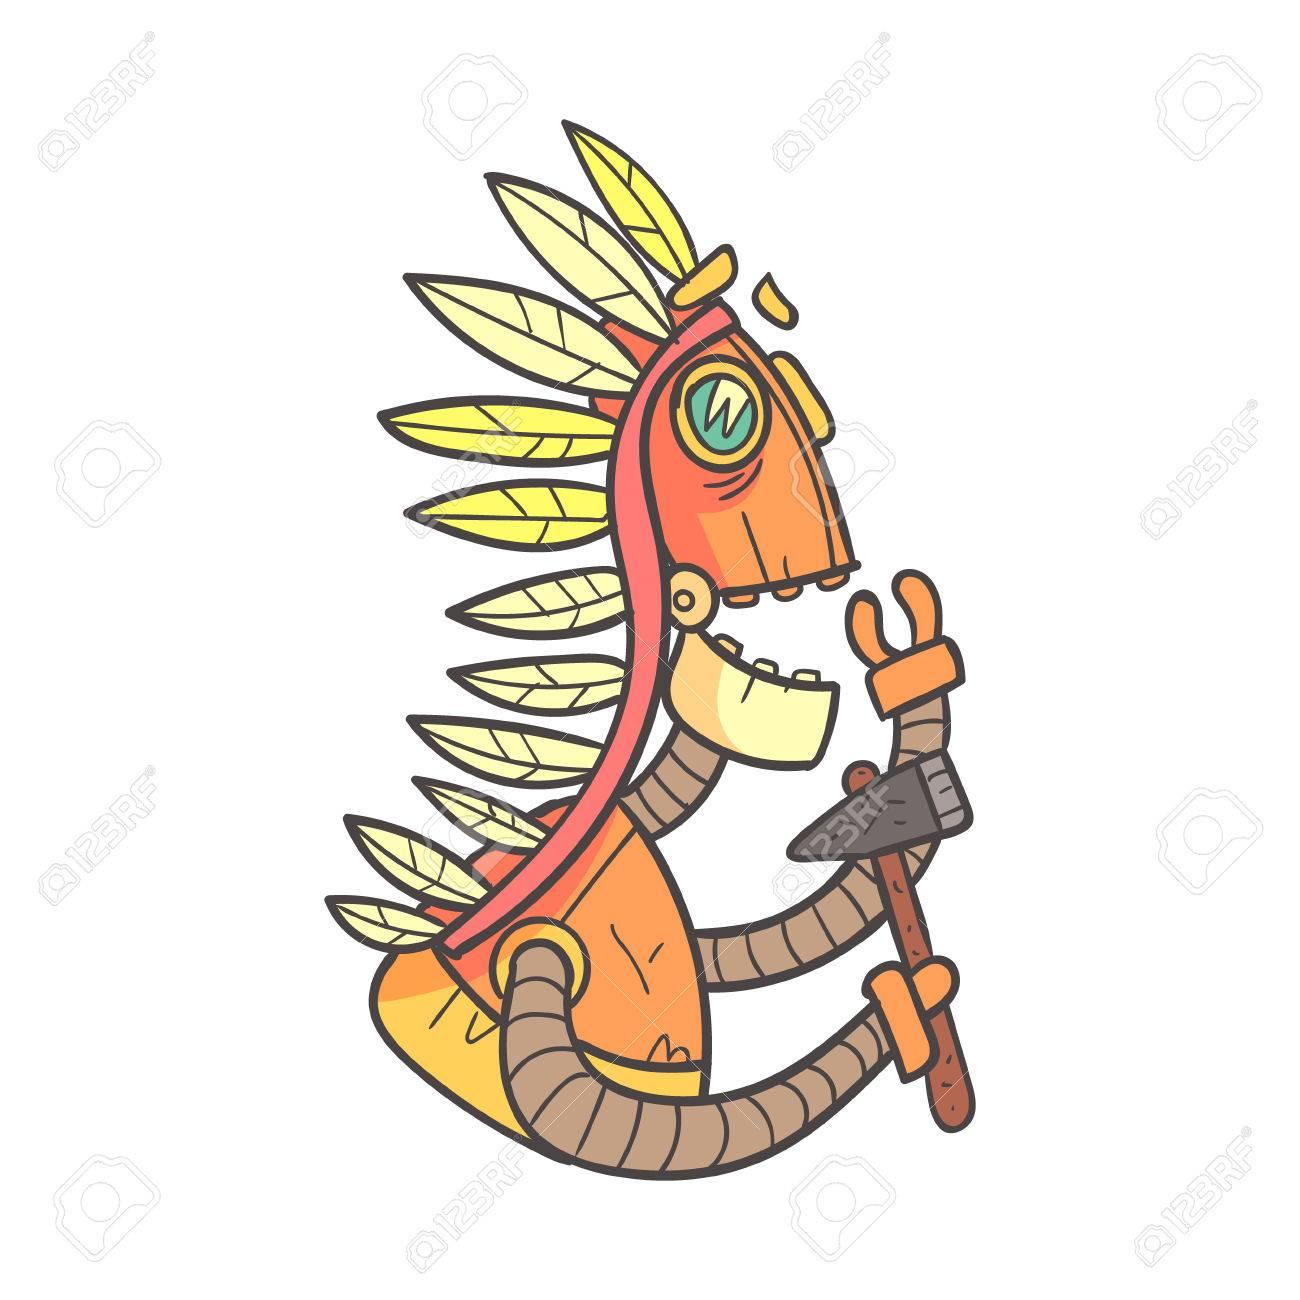 Indian Orange Robot In War Bonnet With Tomahawk Cartoon Stock Photo